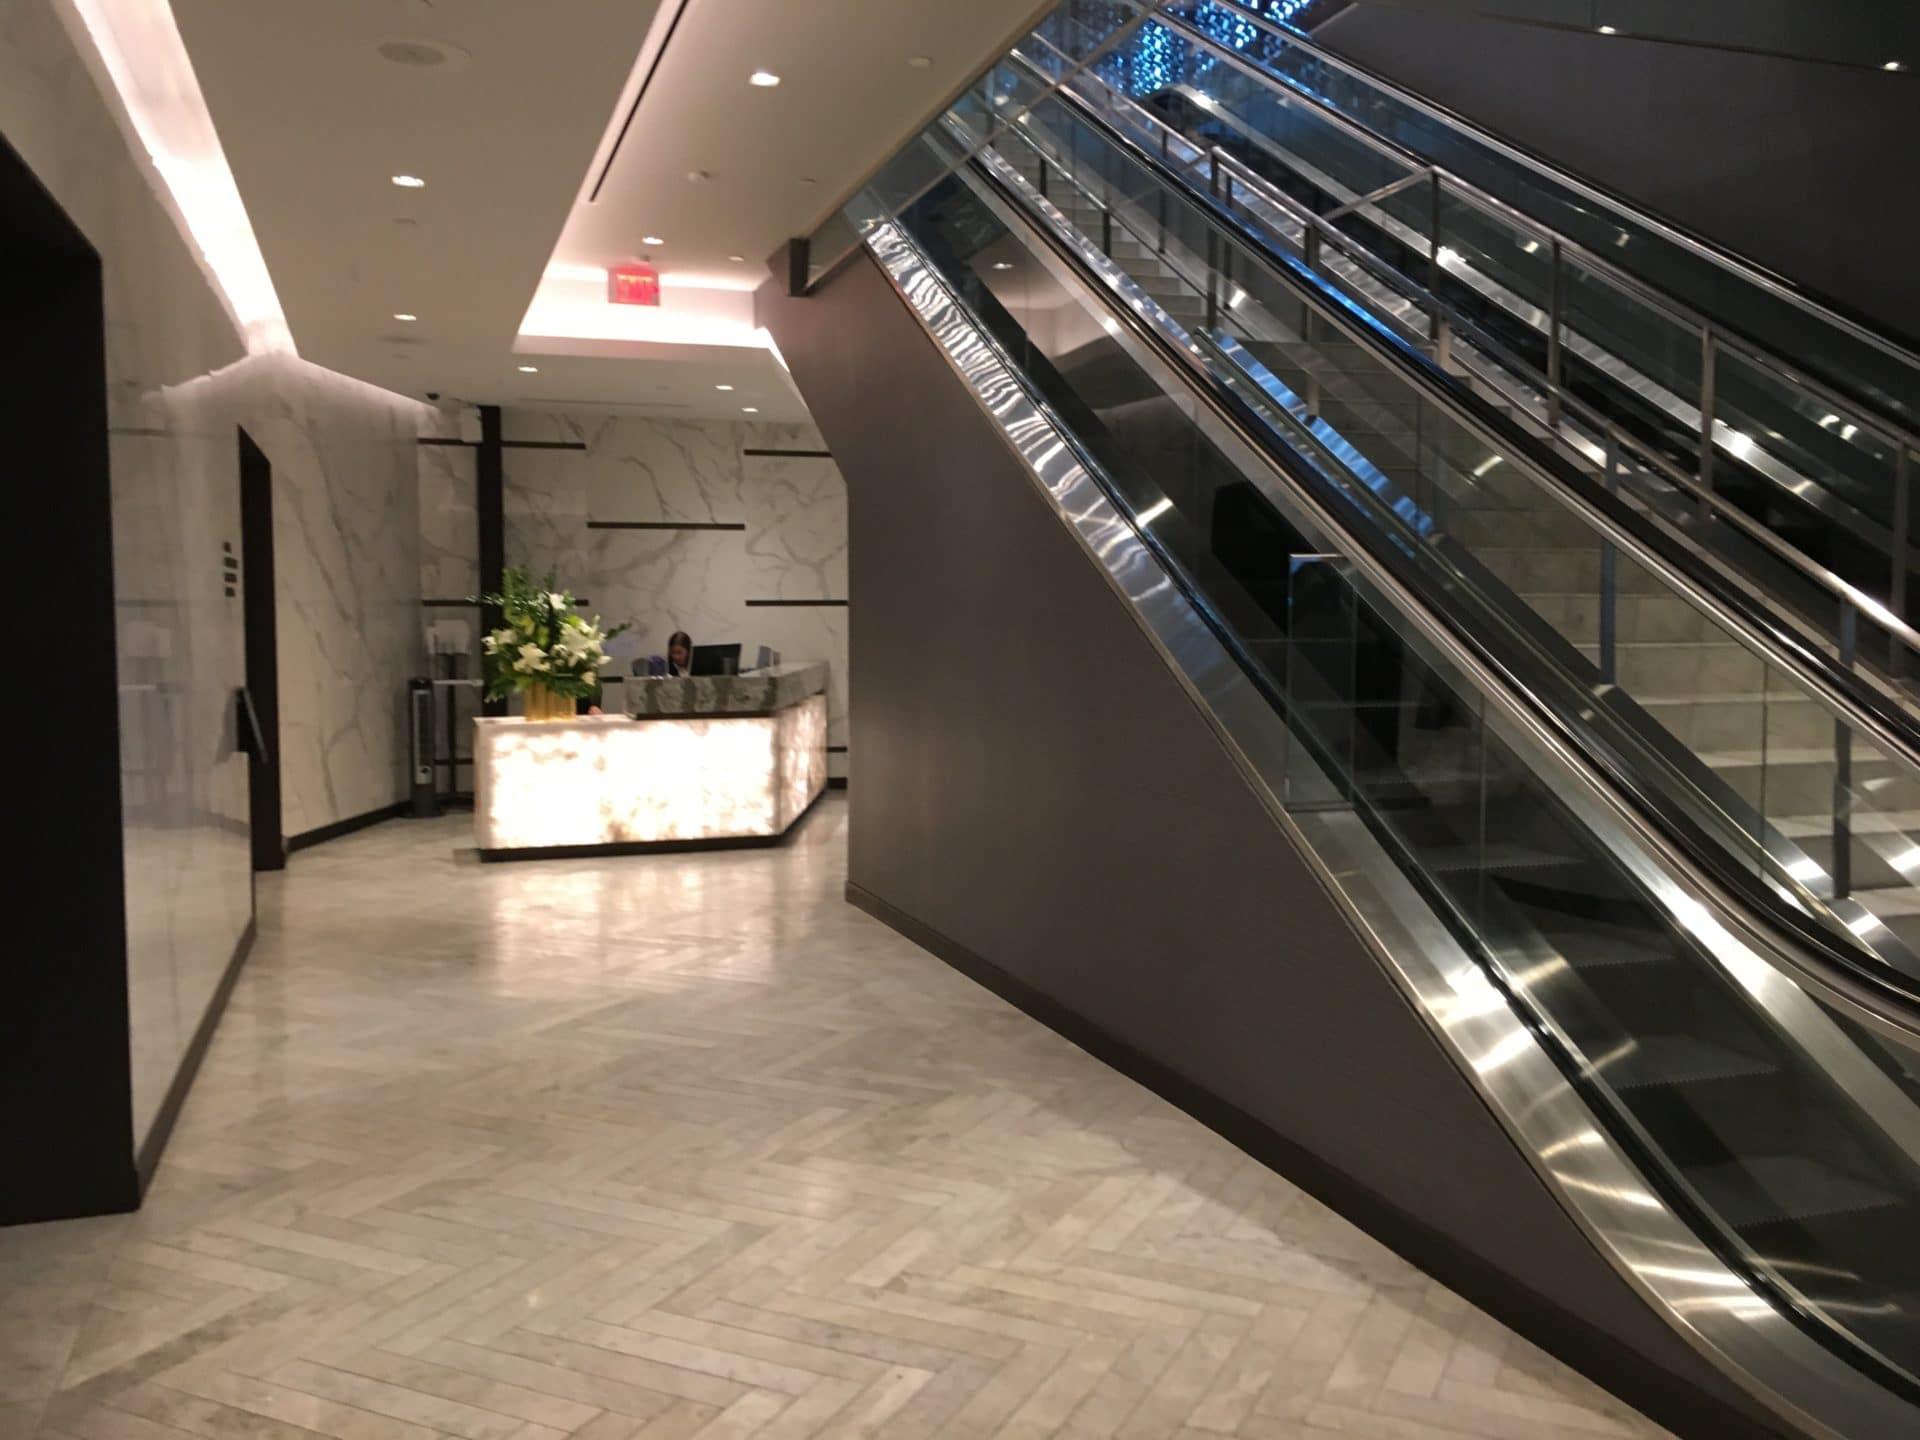 United Polaris Lounge San Francisco Eingangsbereich 2